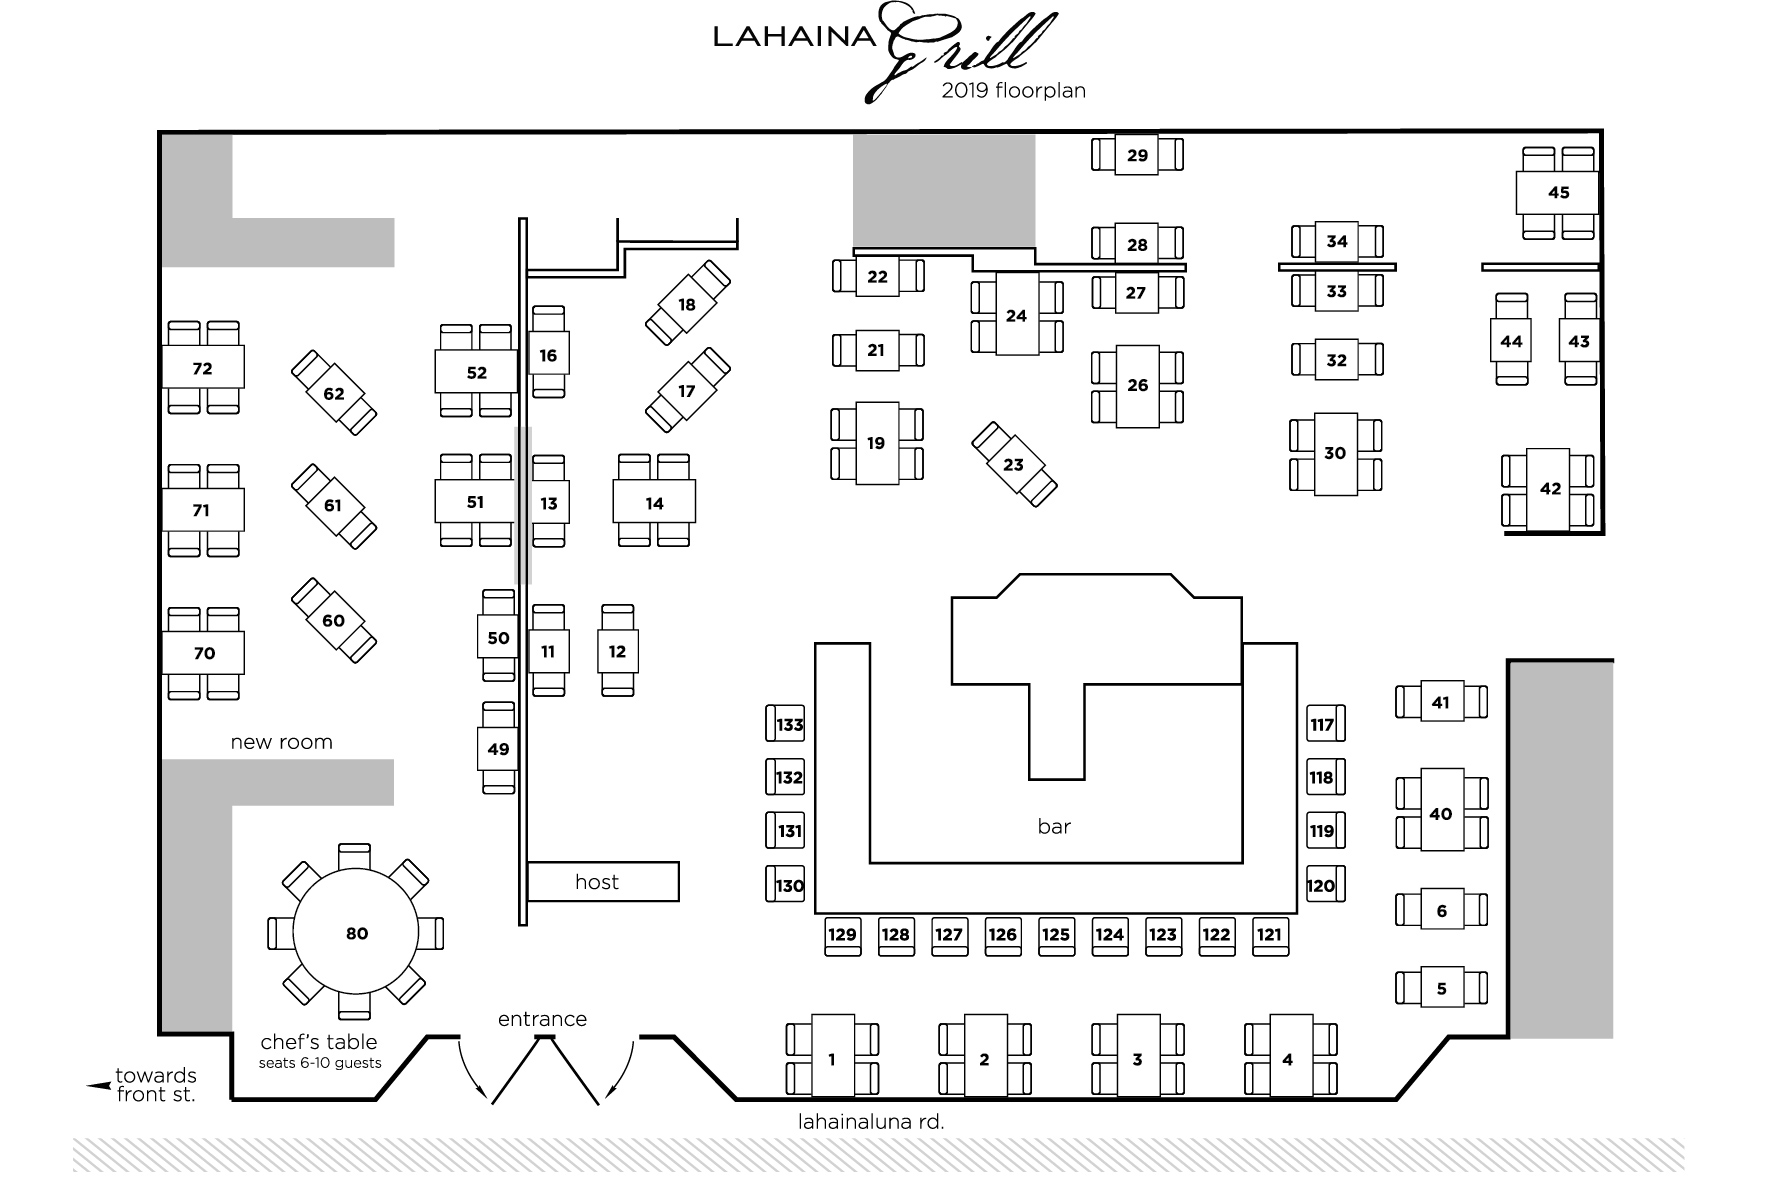 Lahaina Grill Floor Plan